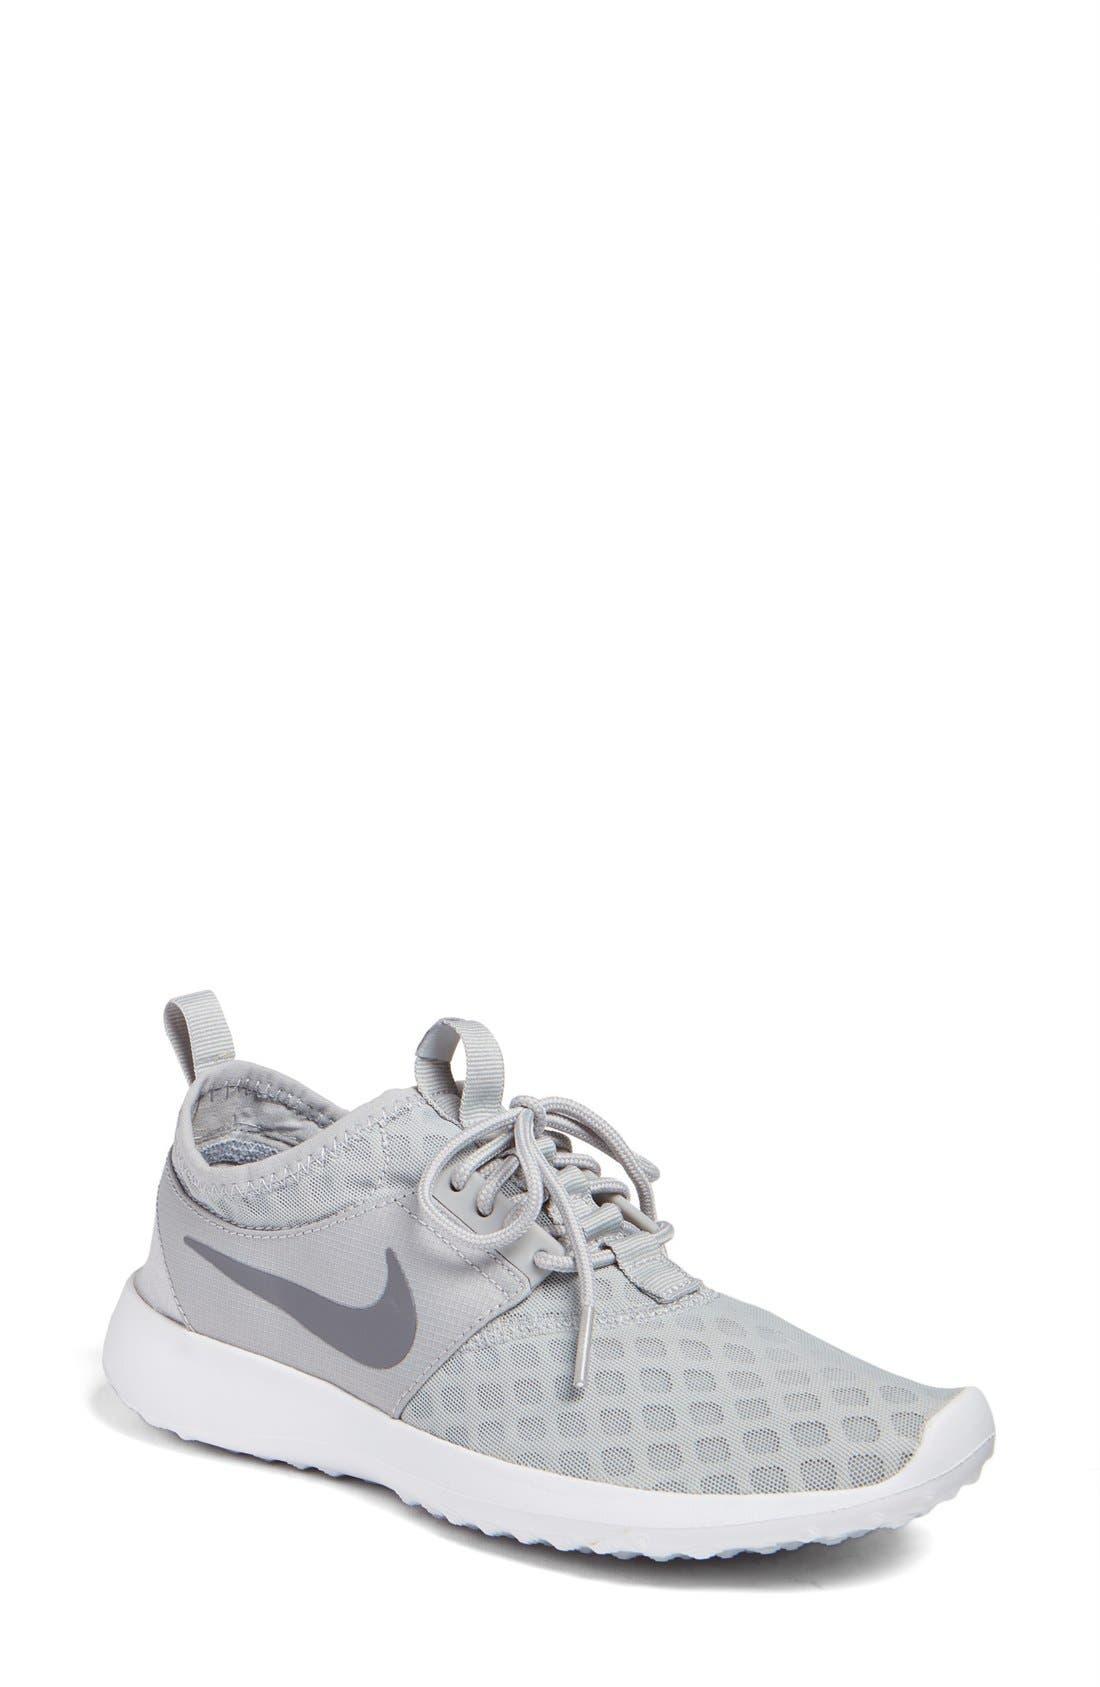 Alternate Image 1 Selected - Nike Juvenate Sneaker (Women)